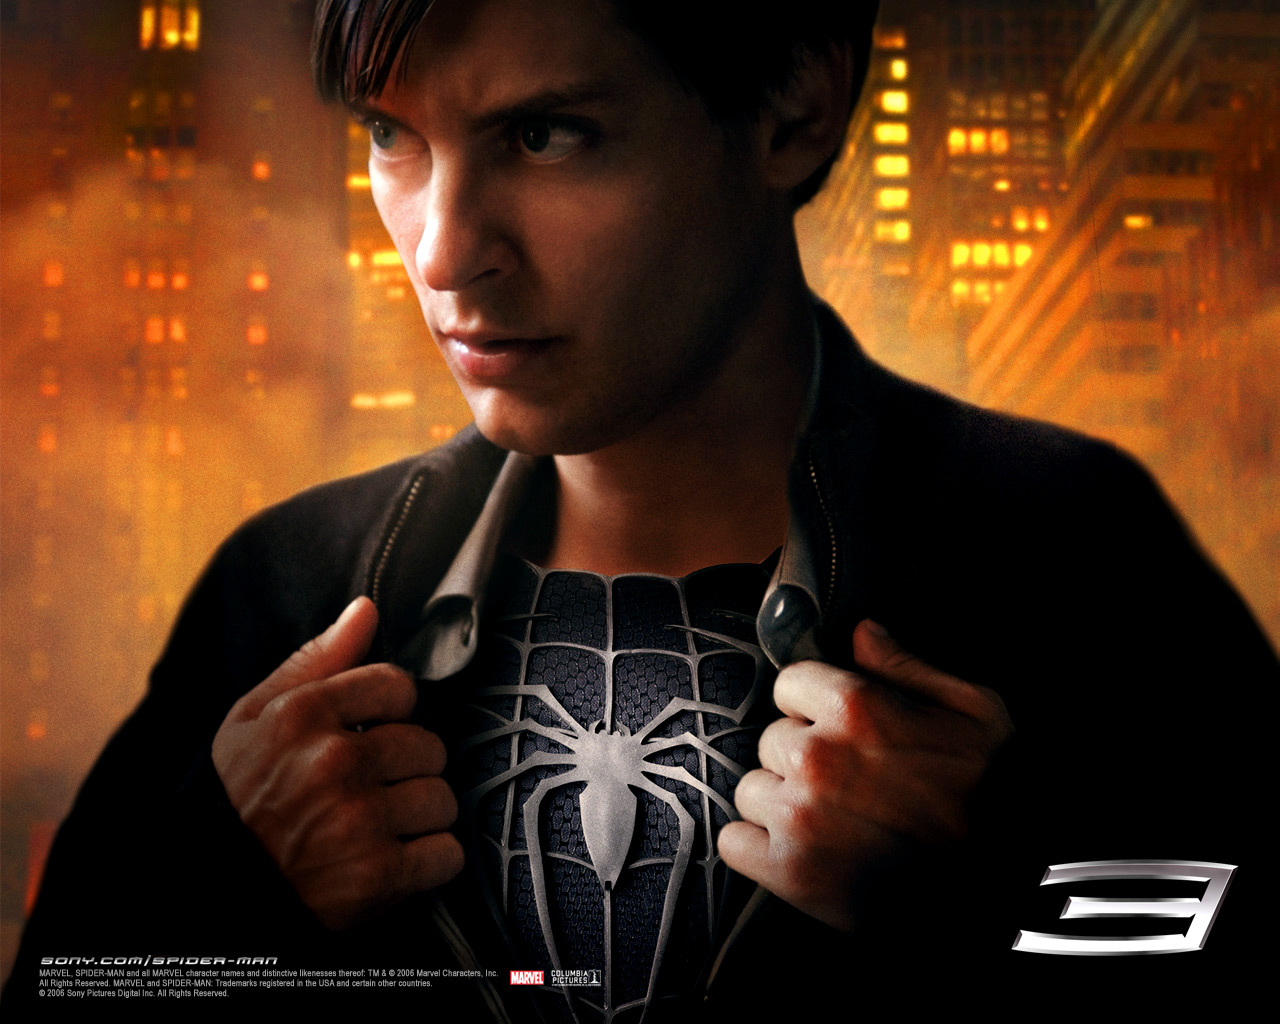 http://4.bp.blogspot.com/-SBk-YA8Xk1A/TirB8g4v1DI/AAAAAAAAC_k/fZhyC1M6g-Q/s1600/spiderman%2B3%2Bwallpaper.jpg